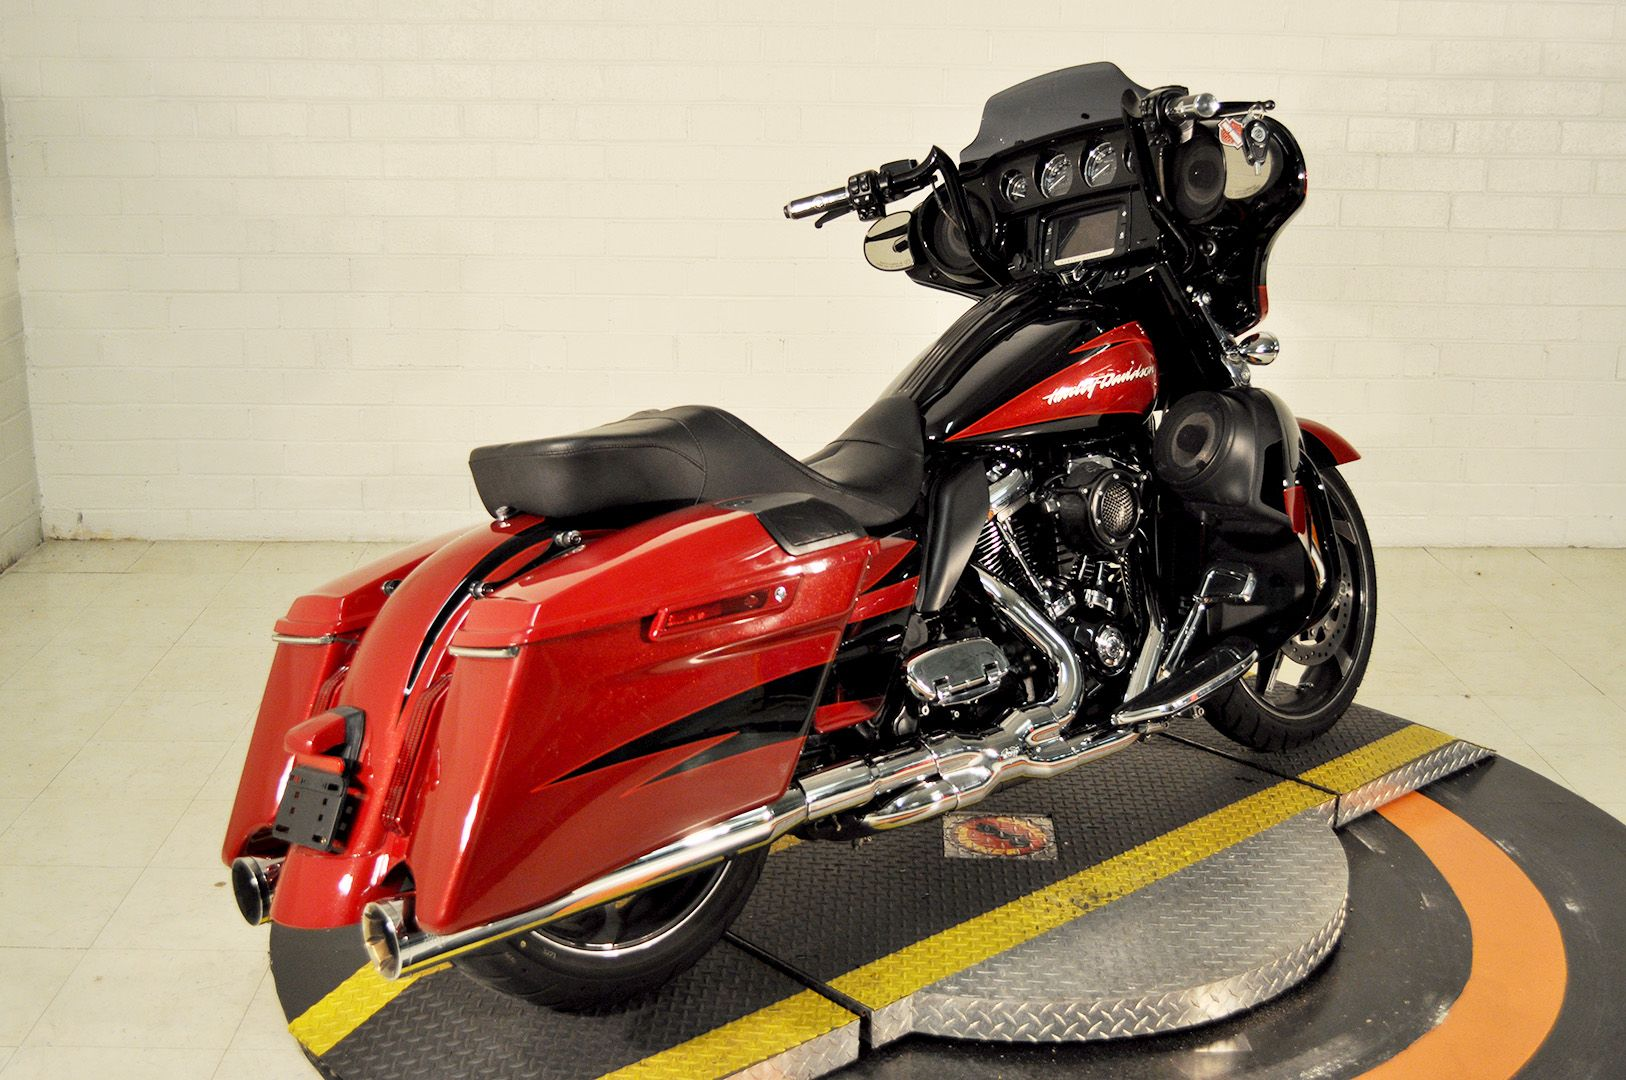 Pre-Owned 2017 Harley-Davidson CVO Street Glide